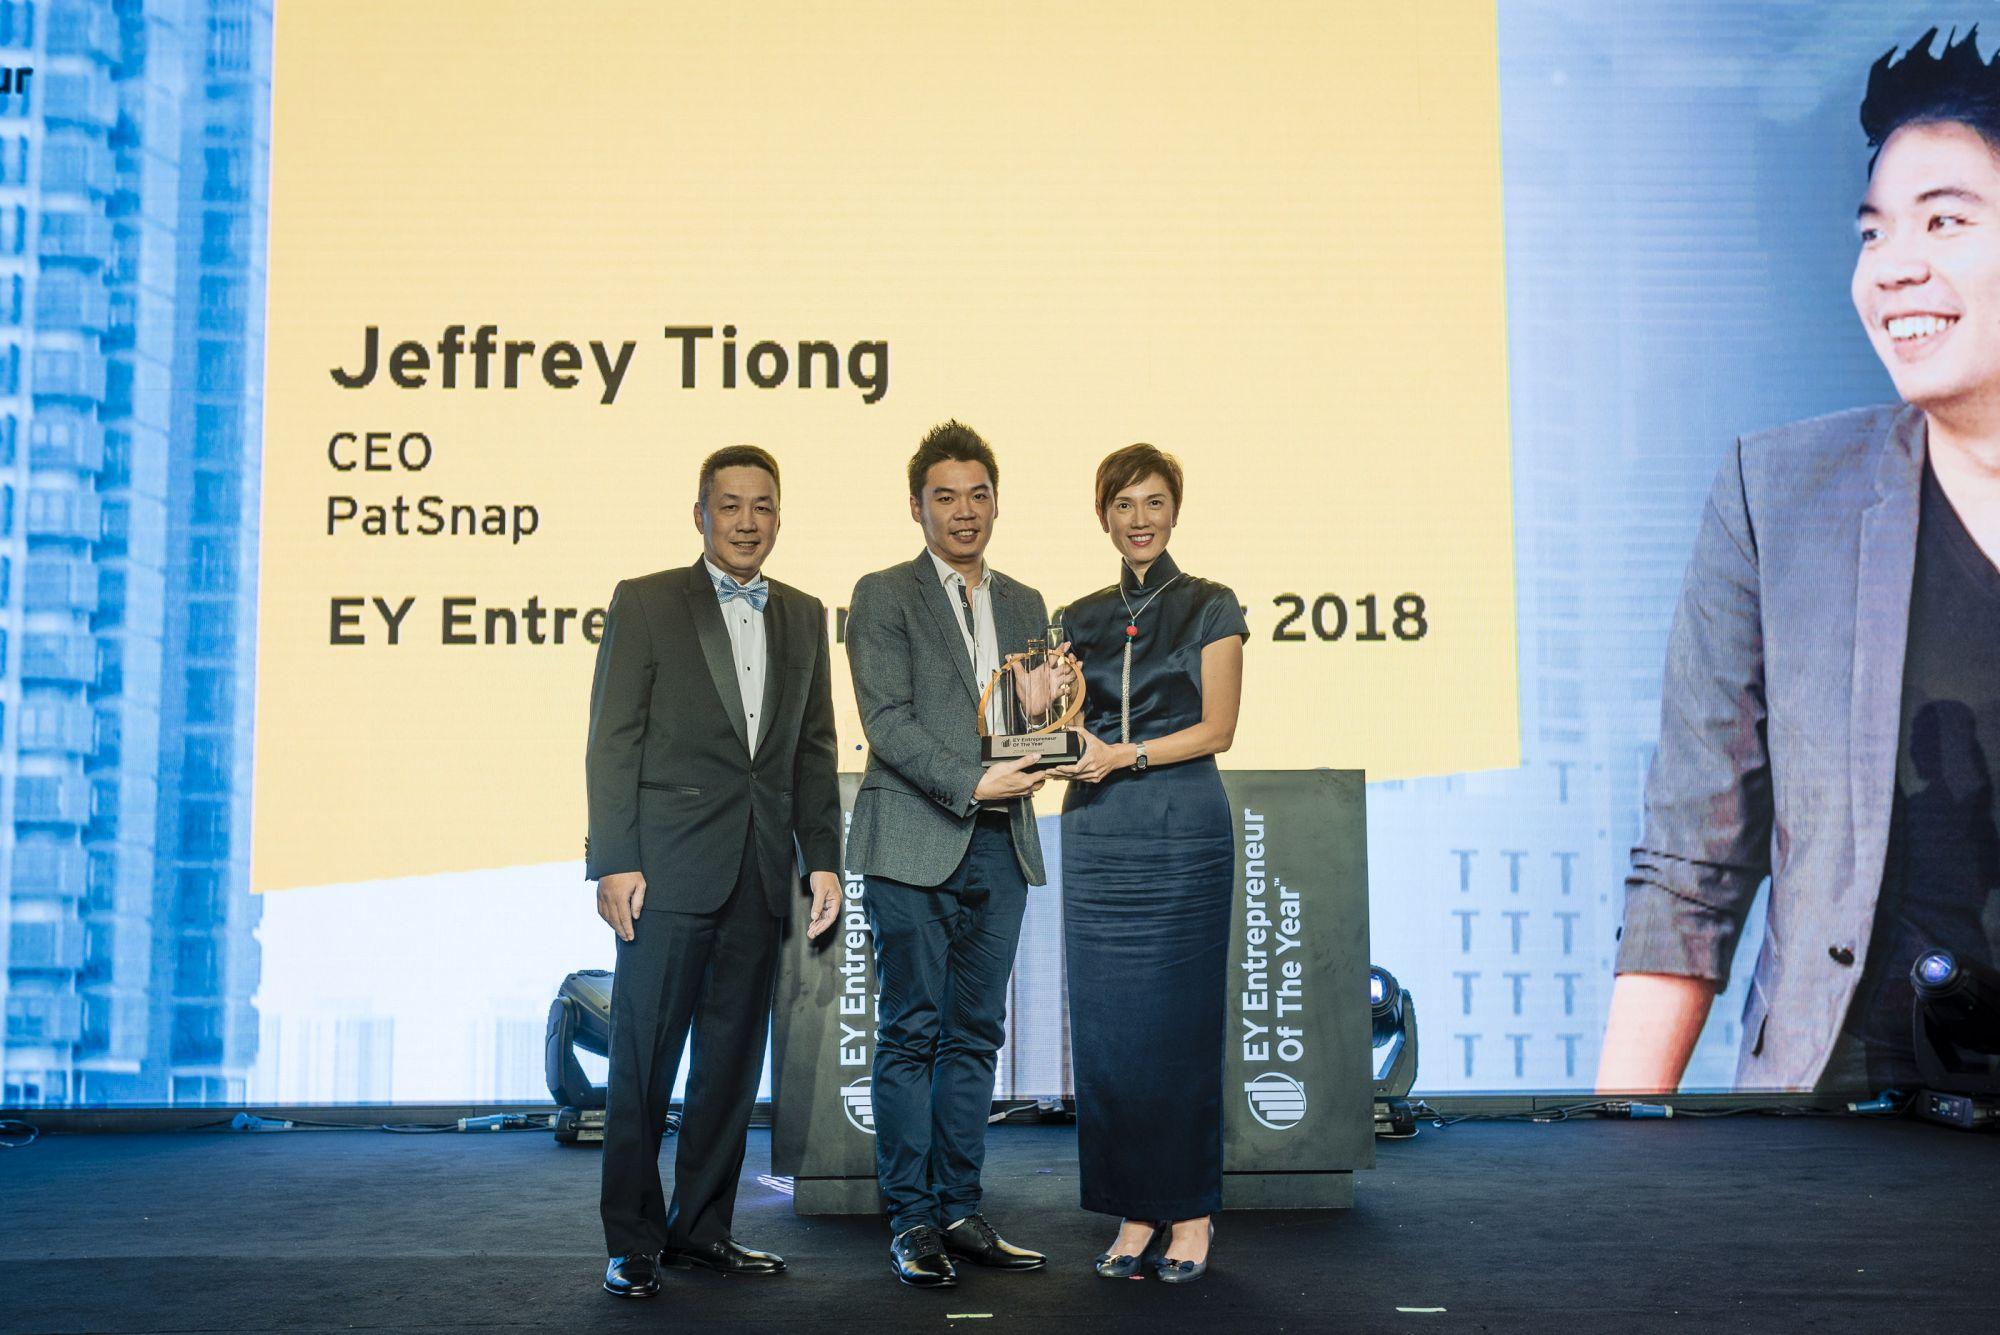 Max Loh, Jeffrey Tiong, Josephine Teo